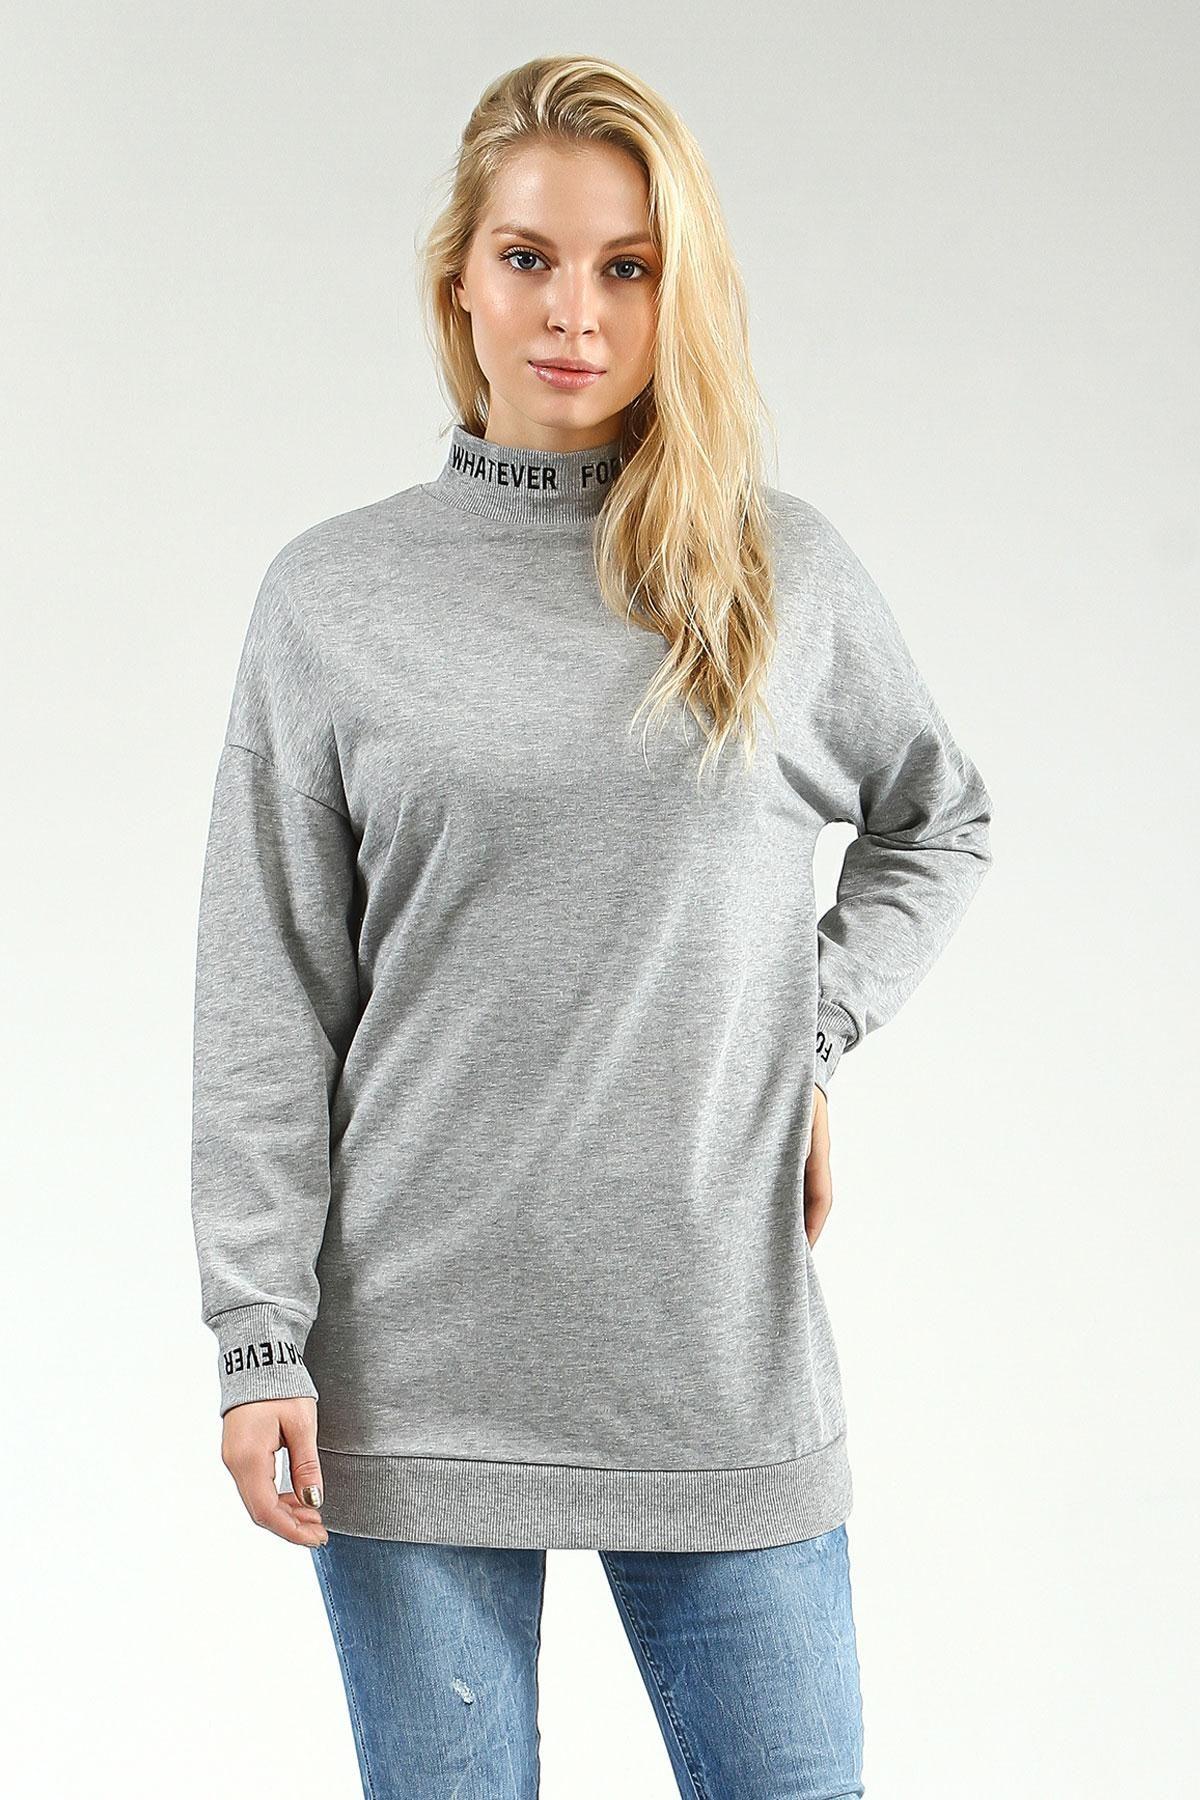 Bayan Collezione Tunik Uzun Kol Yuttii 1761282 13 B Jpg 1200 1800 Fashion Pullover Sweaters